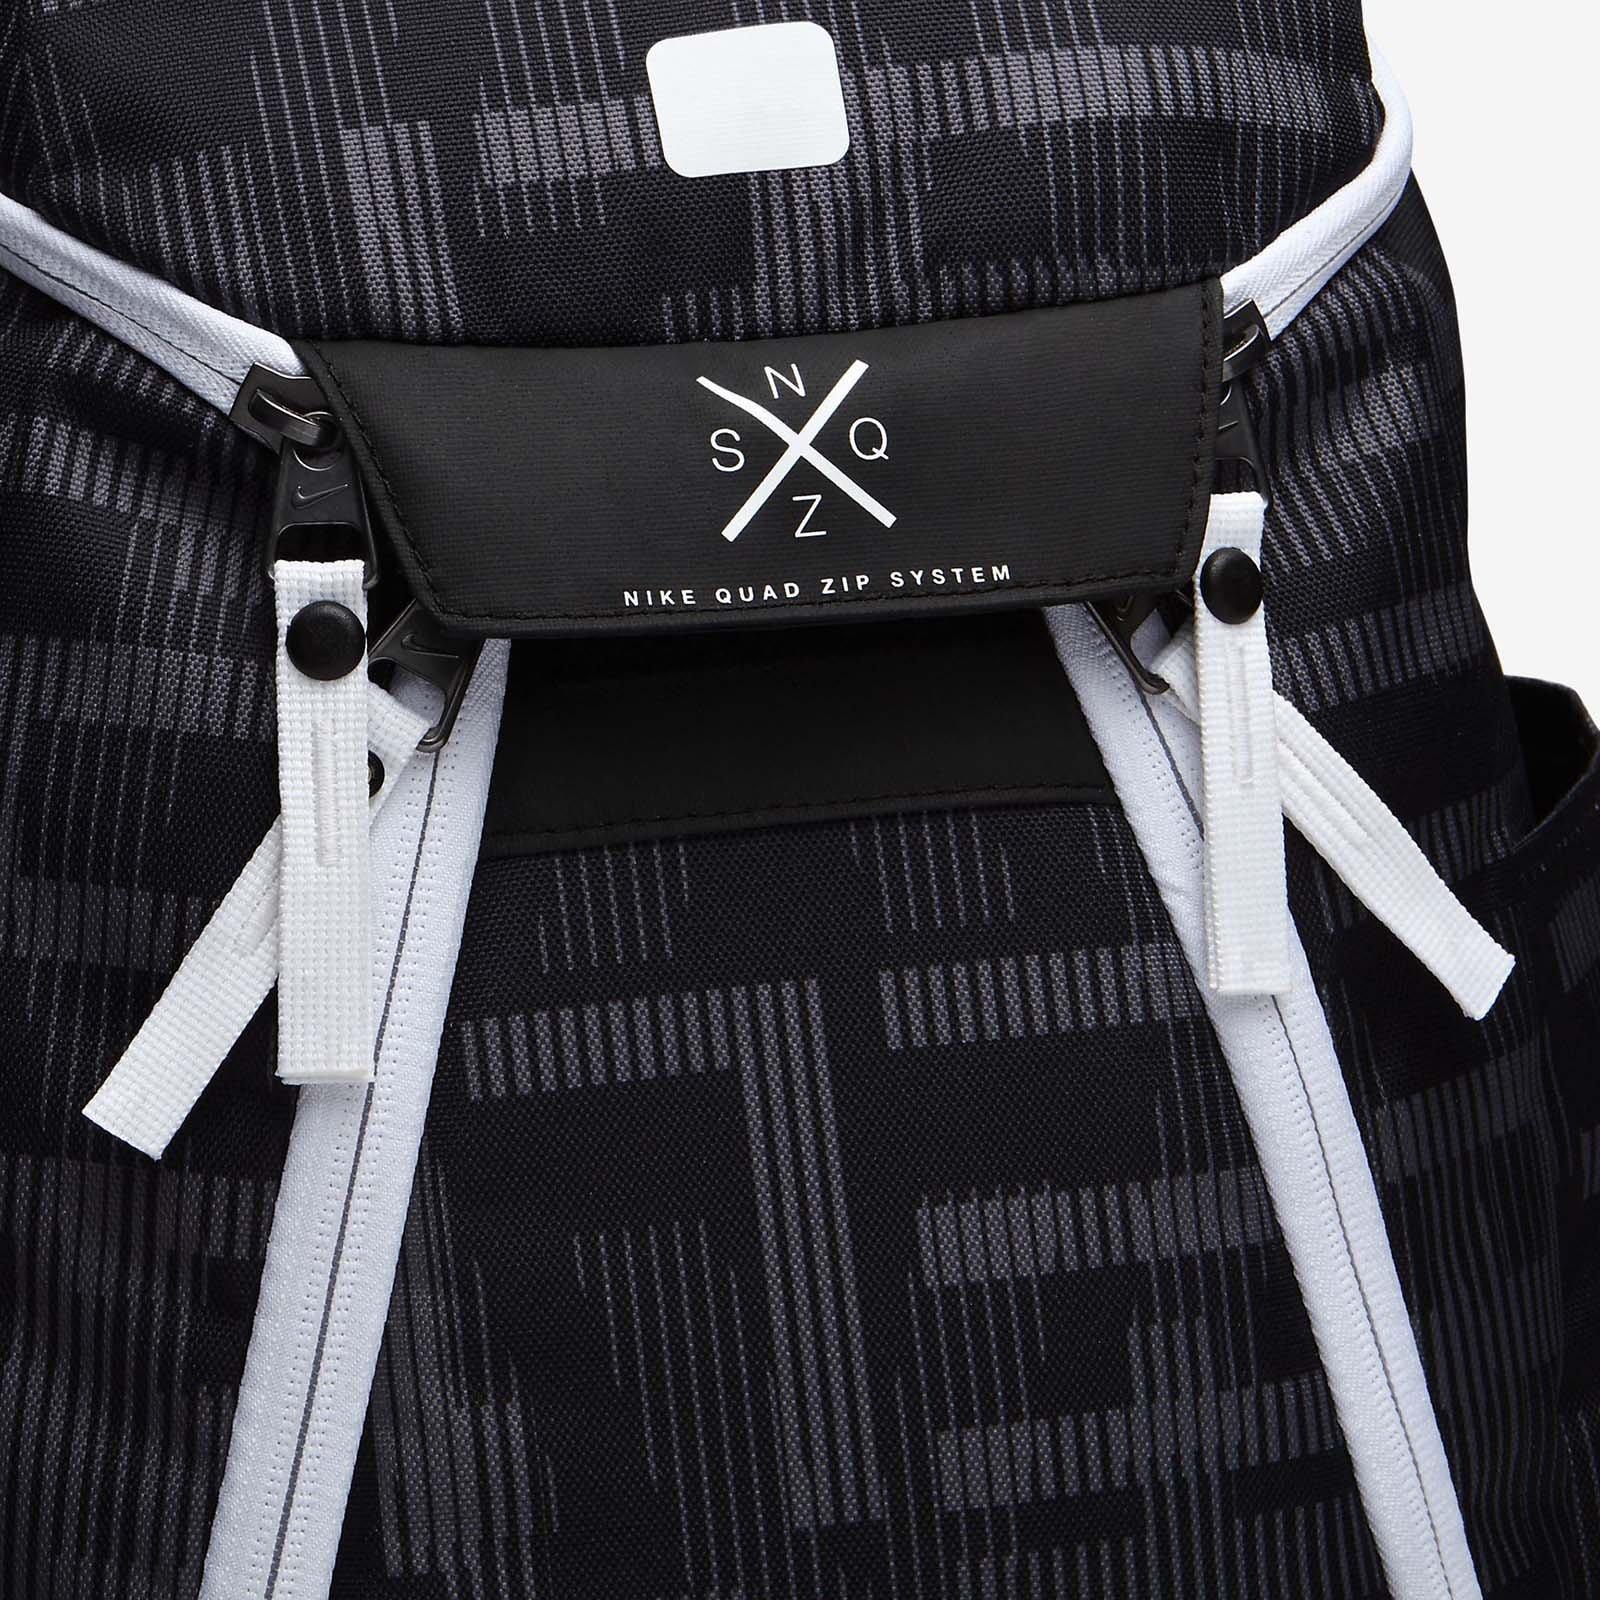 Nike Hoops Elite Max Air Team 2.0 Graphic Basketball Backpack Black/White by NIKE (Image #4)